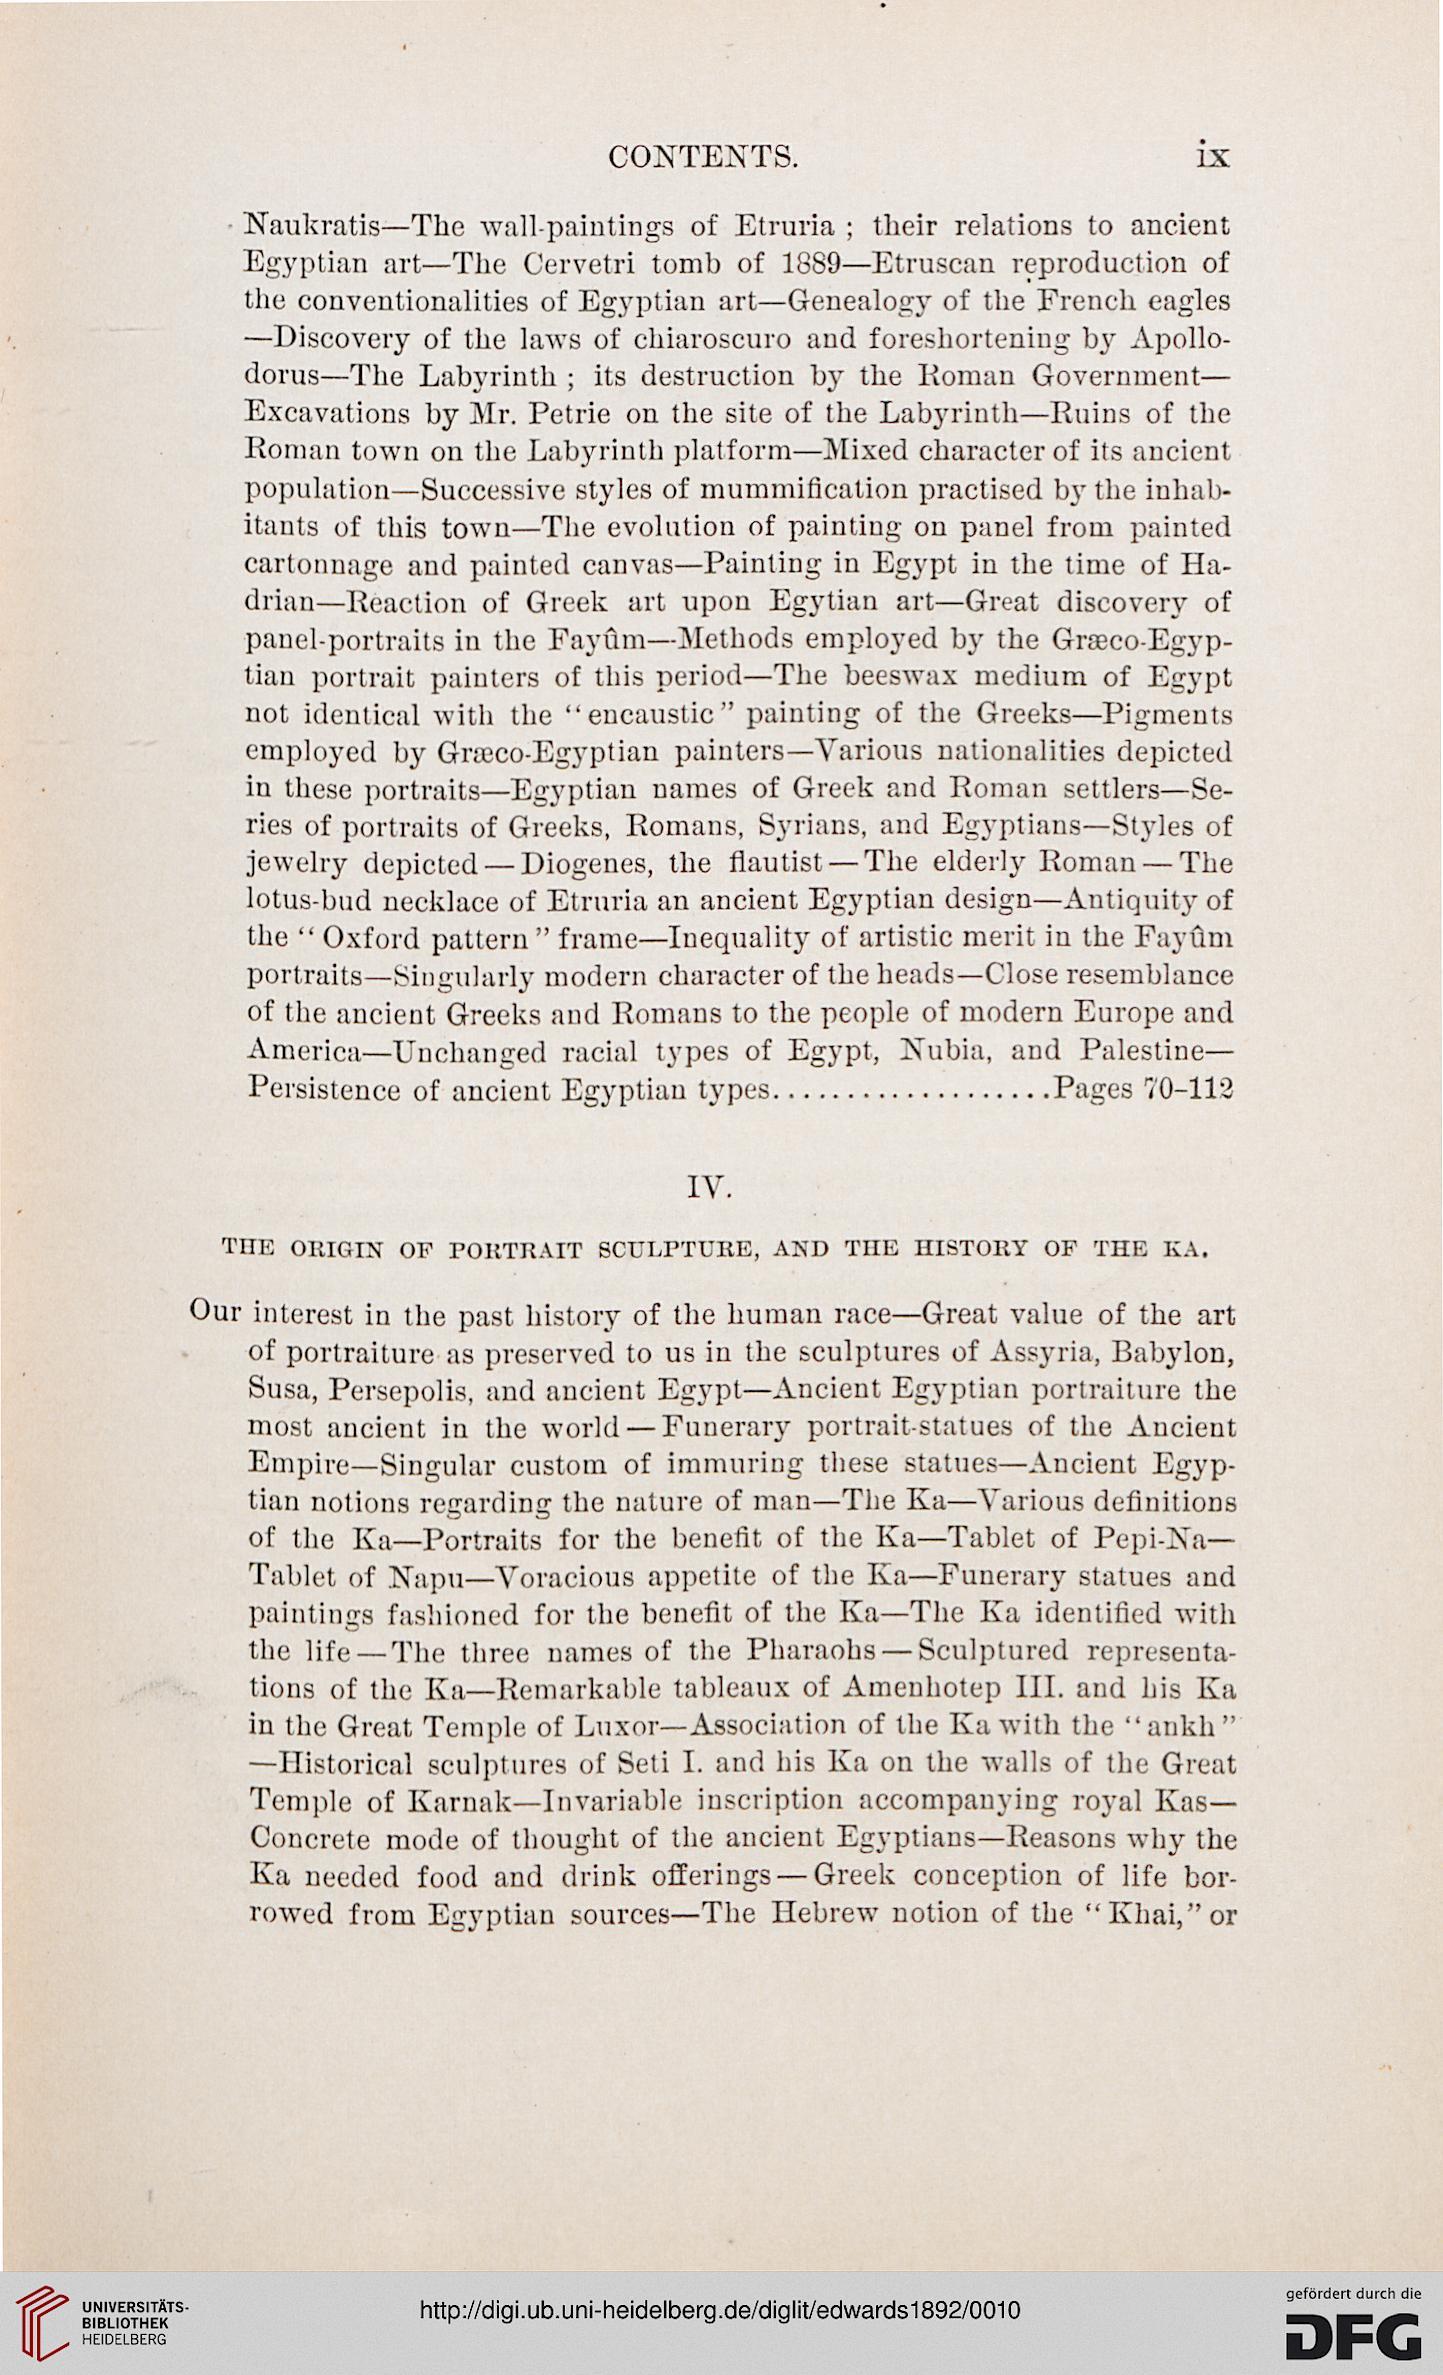 Edwards, Amelia B : Pharaohs, fellahs and explorers (New York, NY, 1892)